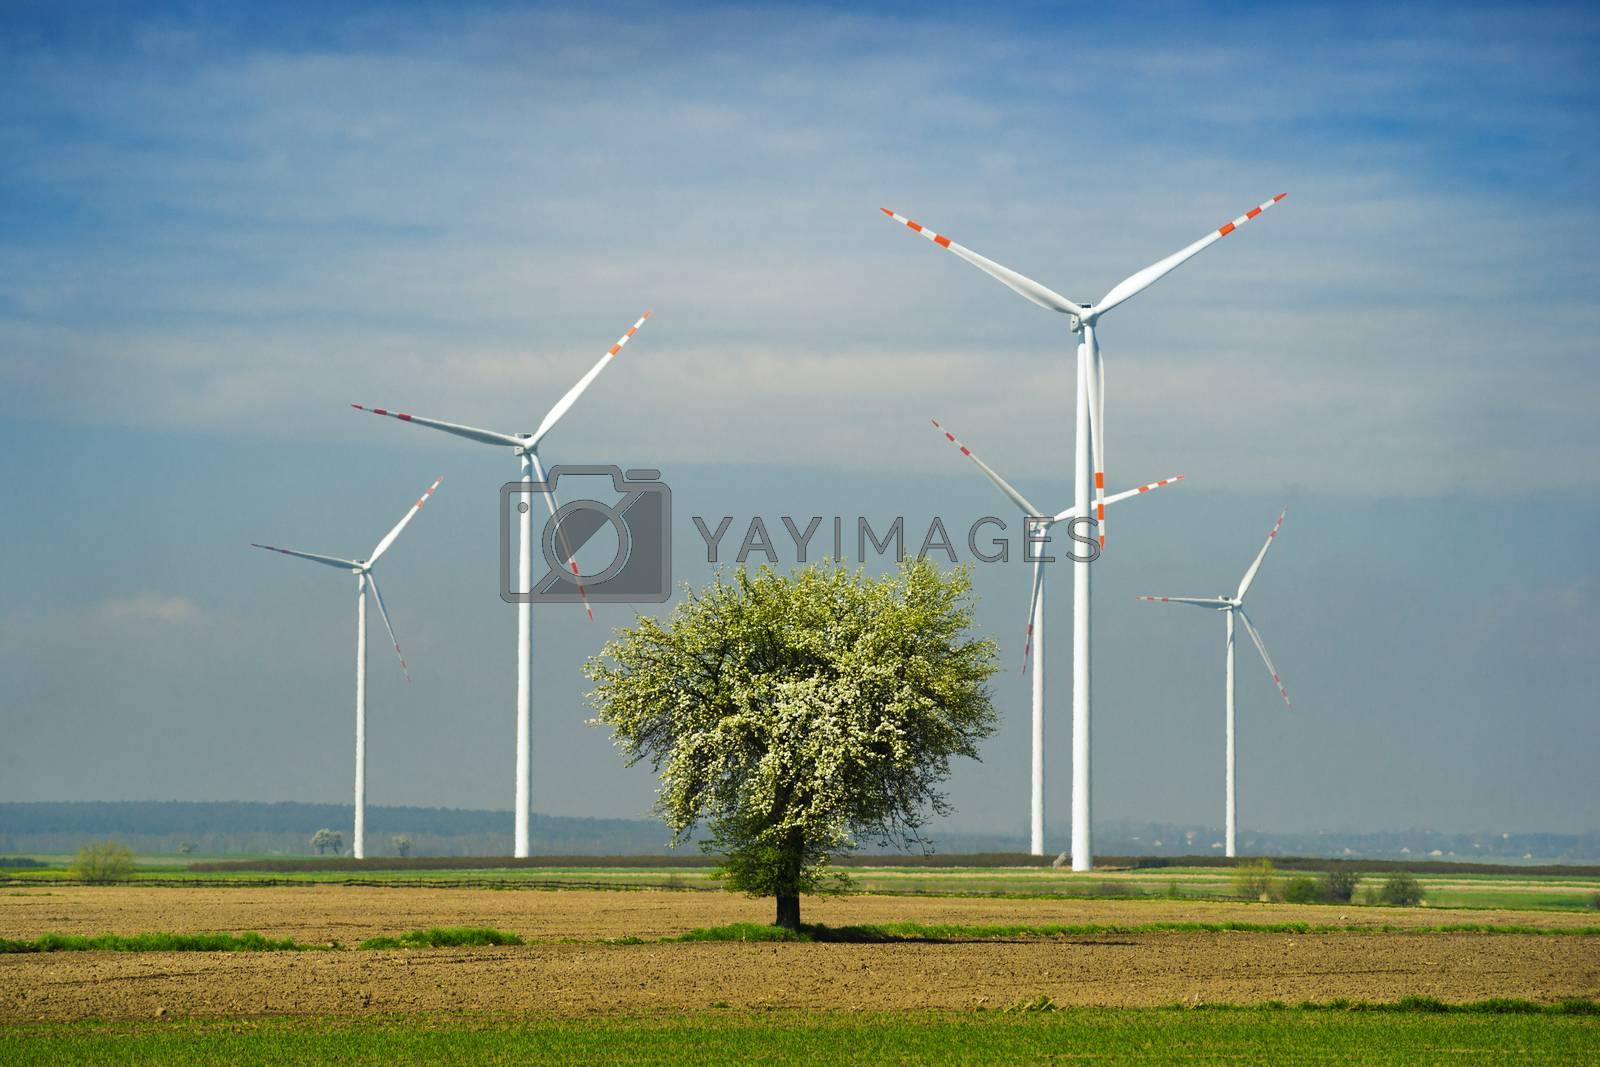 Wind turbine. by Pietus